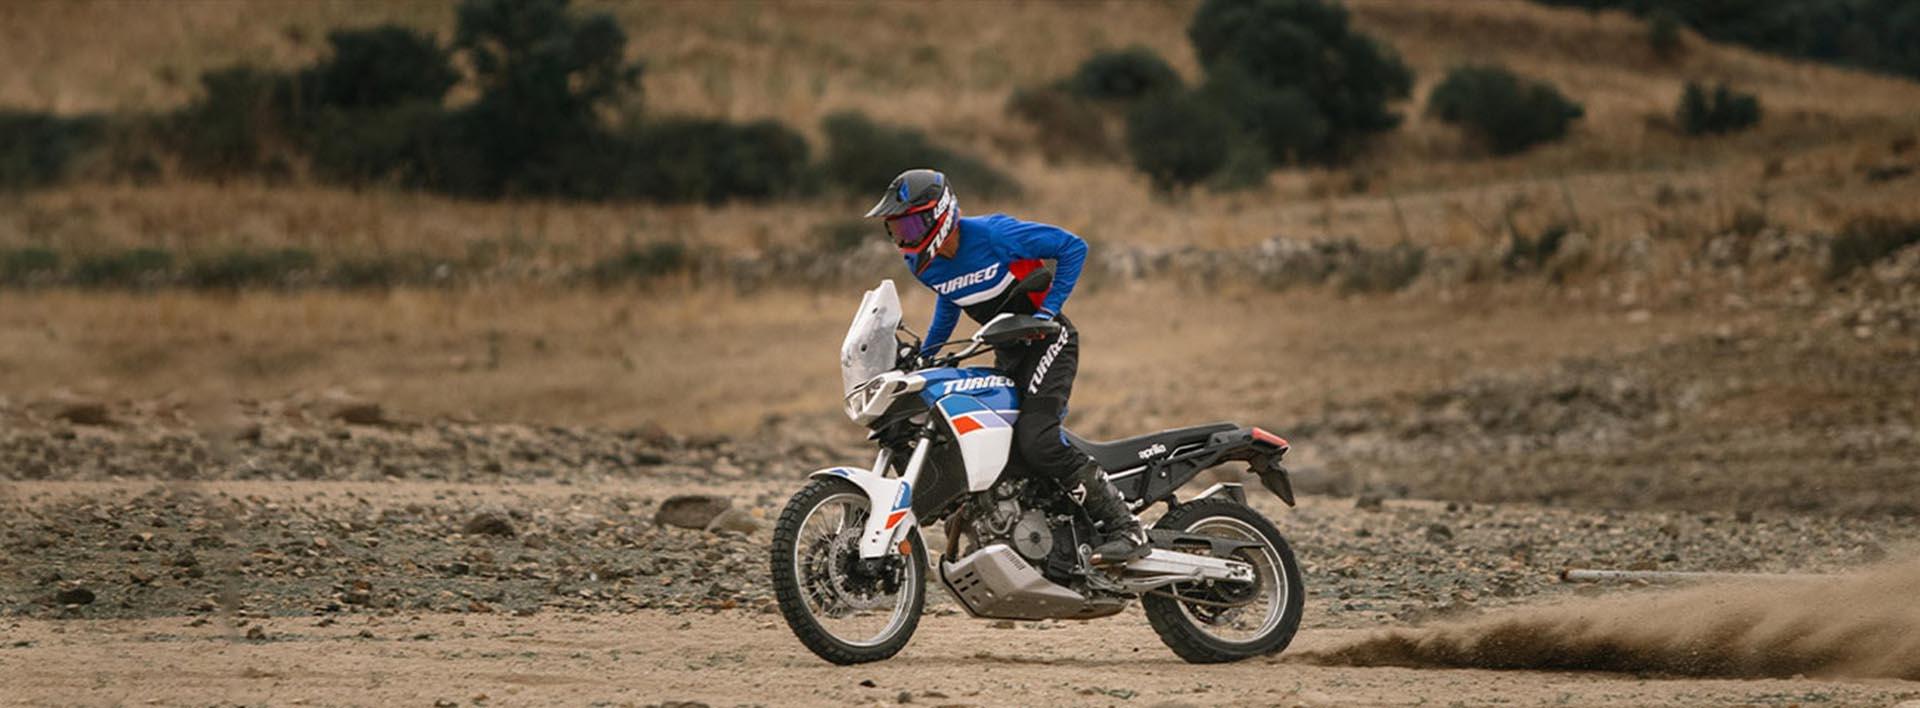 Aprilia New Motorcycle Range